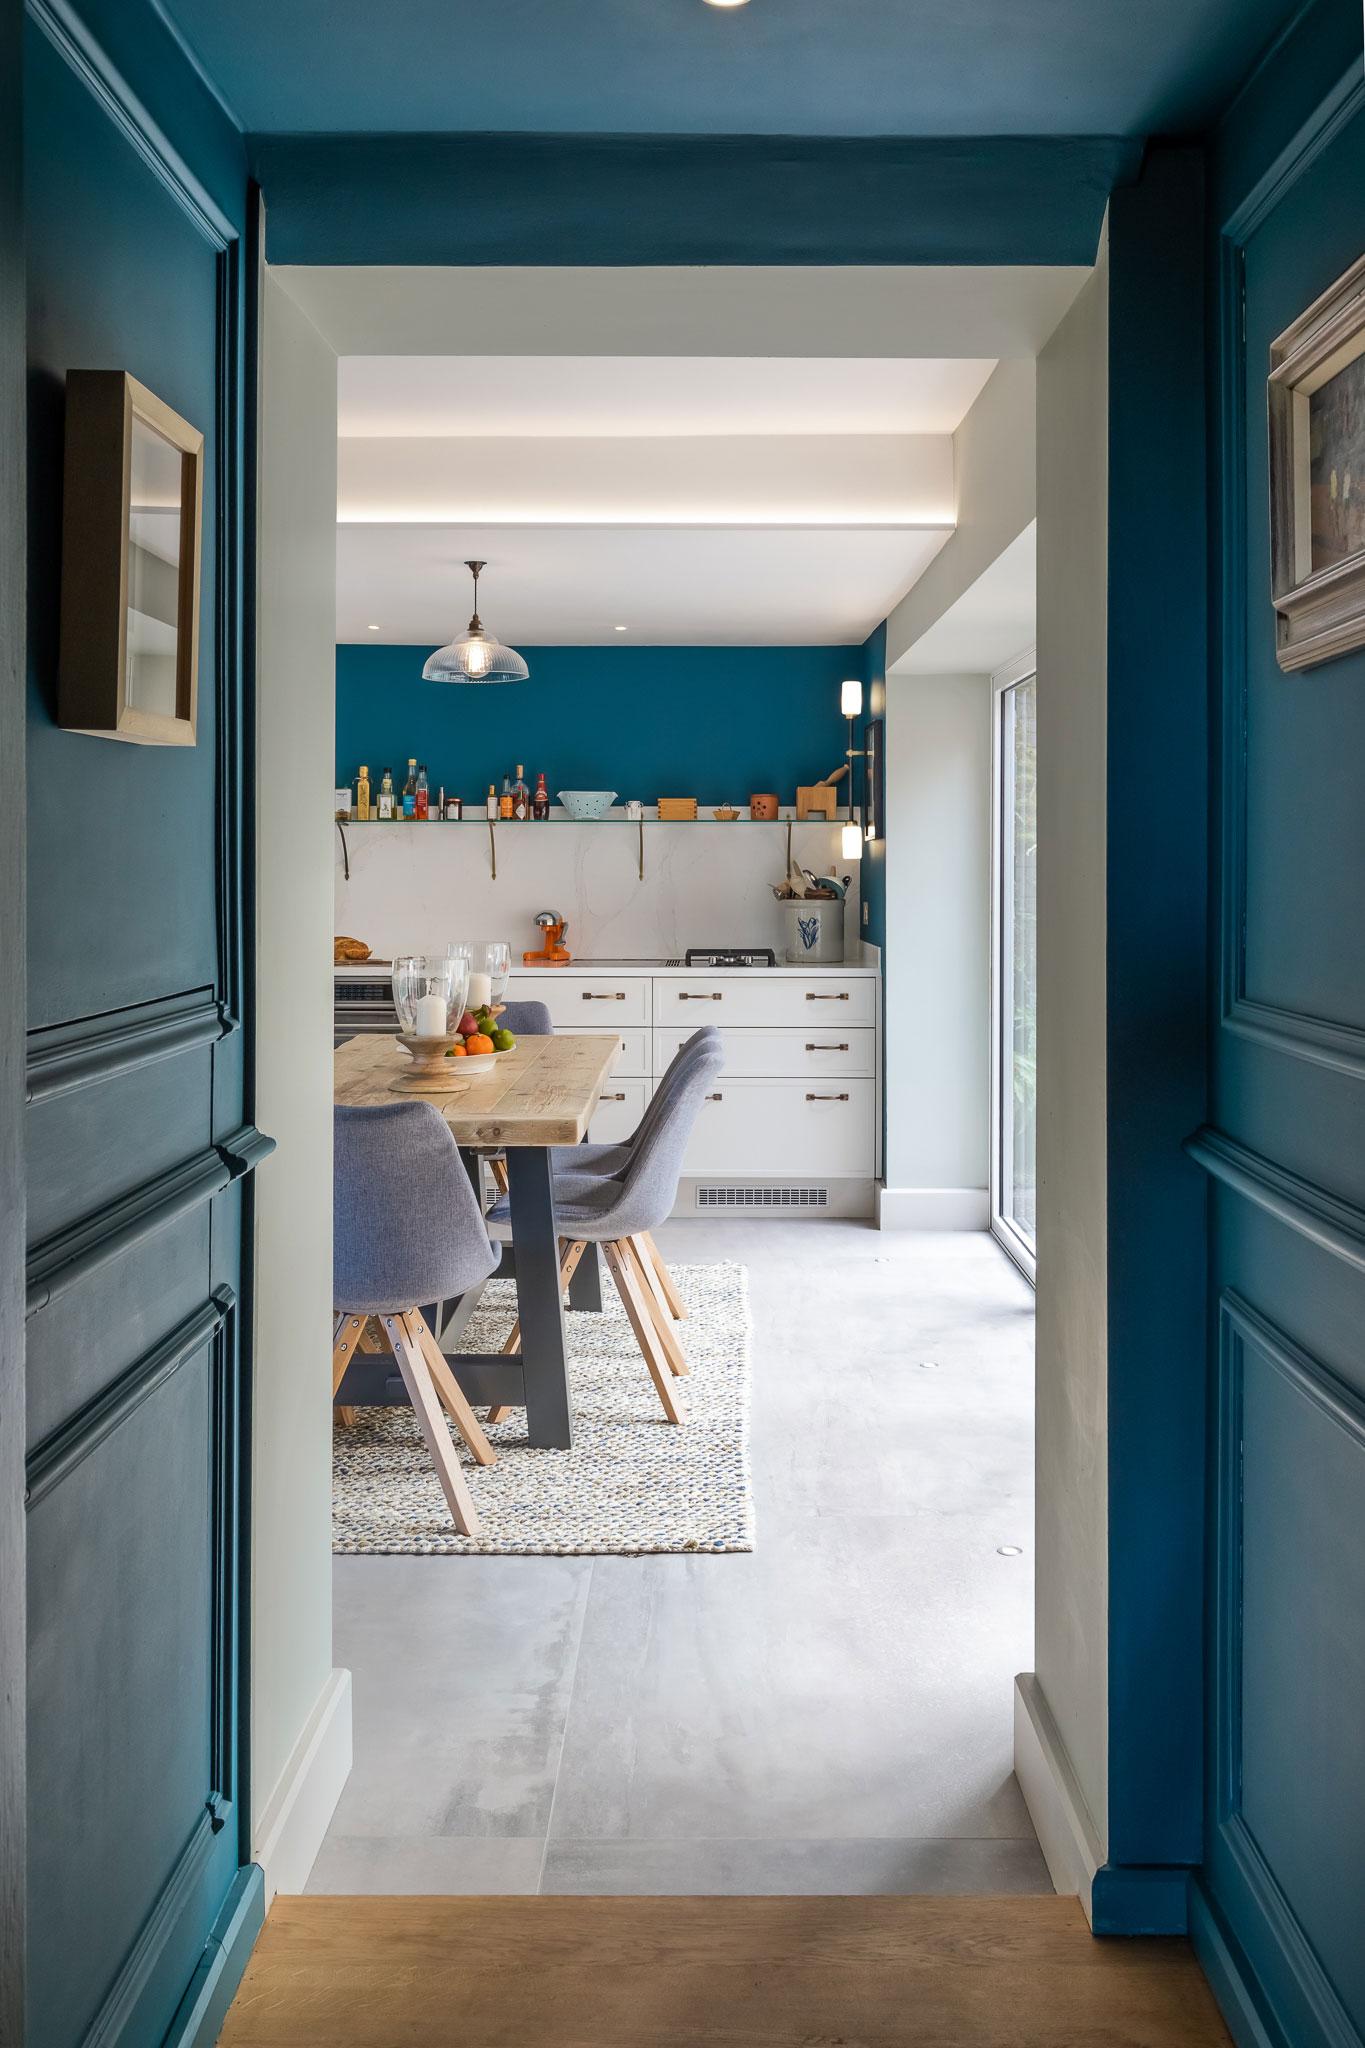 kitchen remodel, Modern Kitchen Remodel Transforms Communal Space